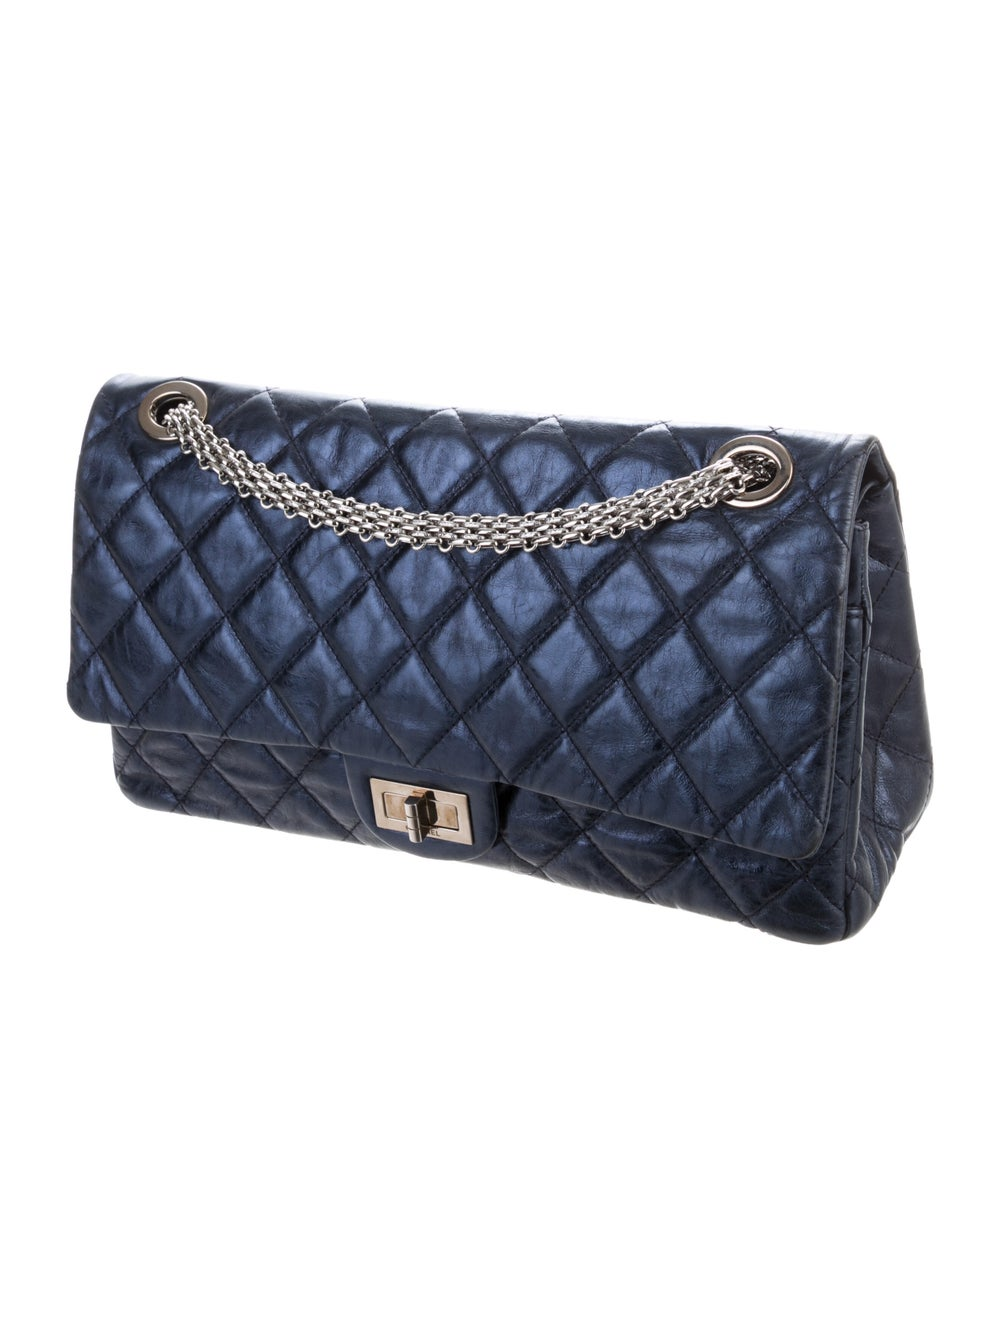 Chanel Reissue 2.55 Classic 227 Flap Bag Blue - image 3